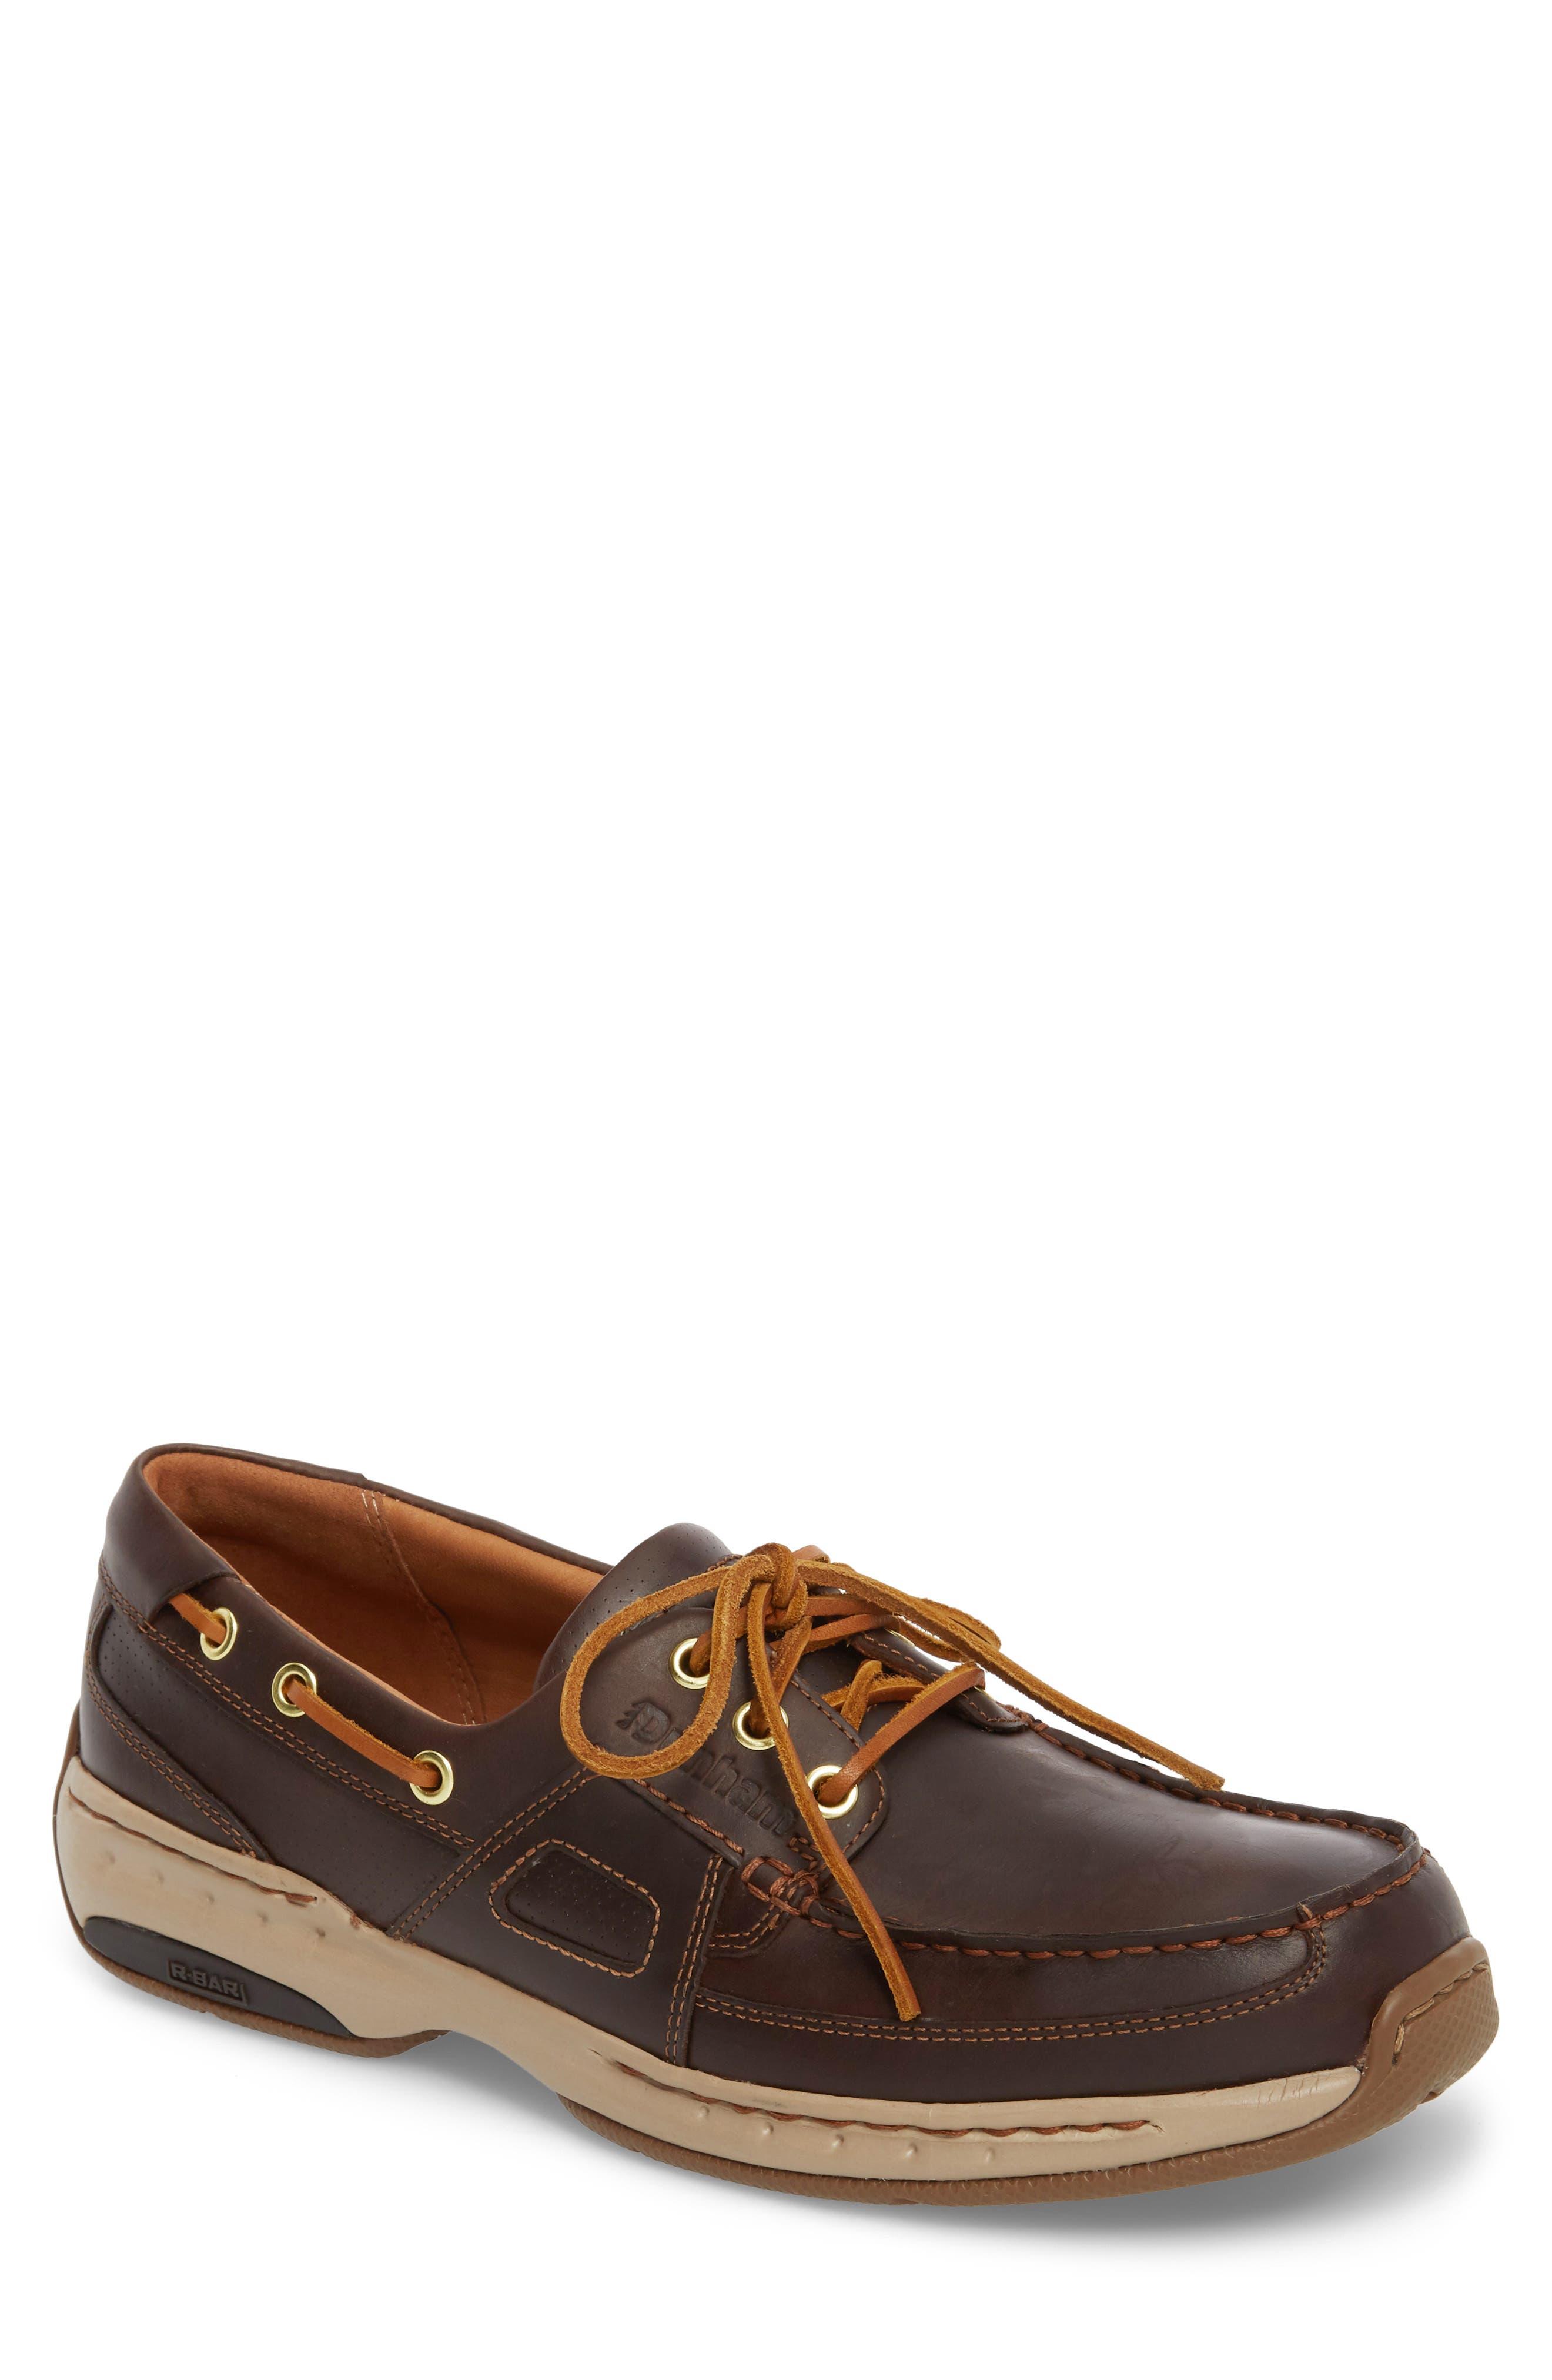 LTD Water Resistant Boat Shoe,                             Main thumbnail 1, color,                             Tan Leather